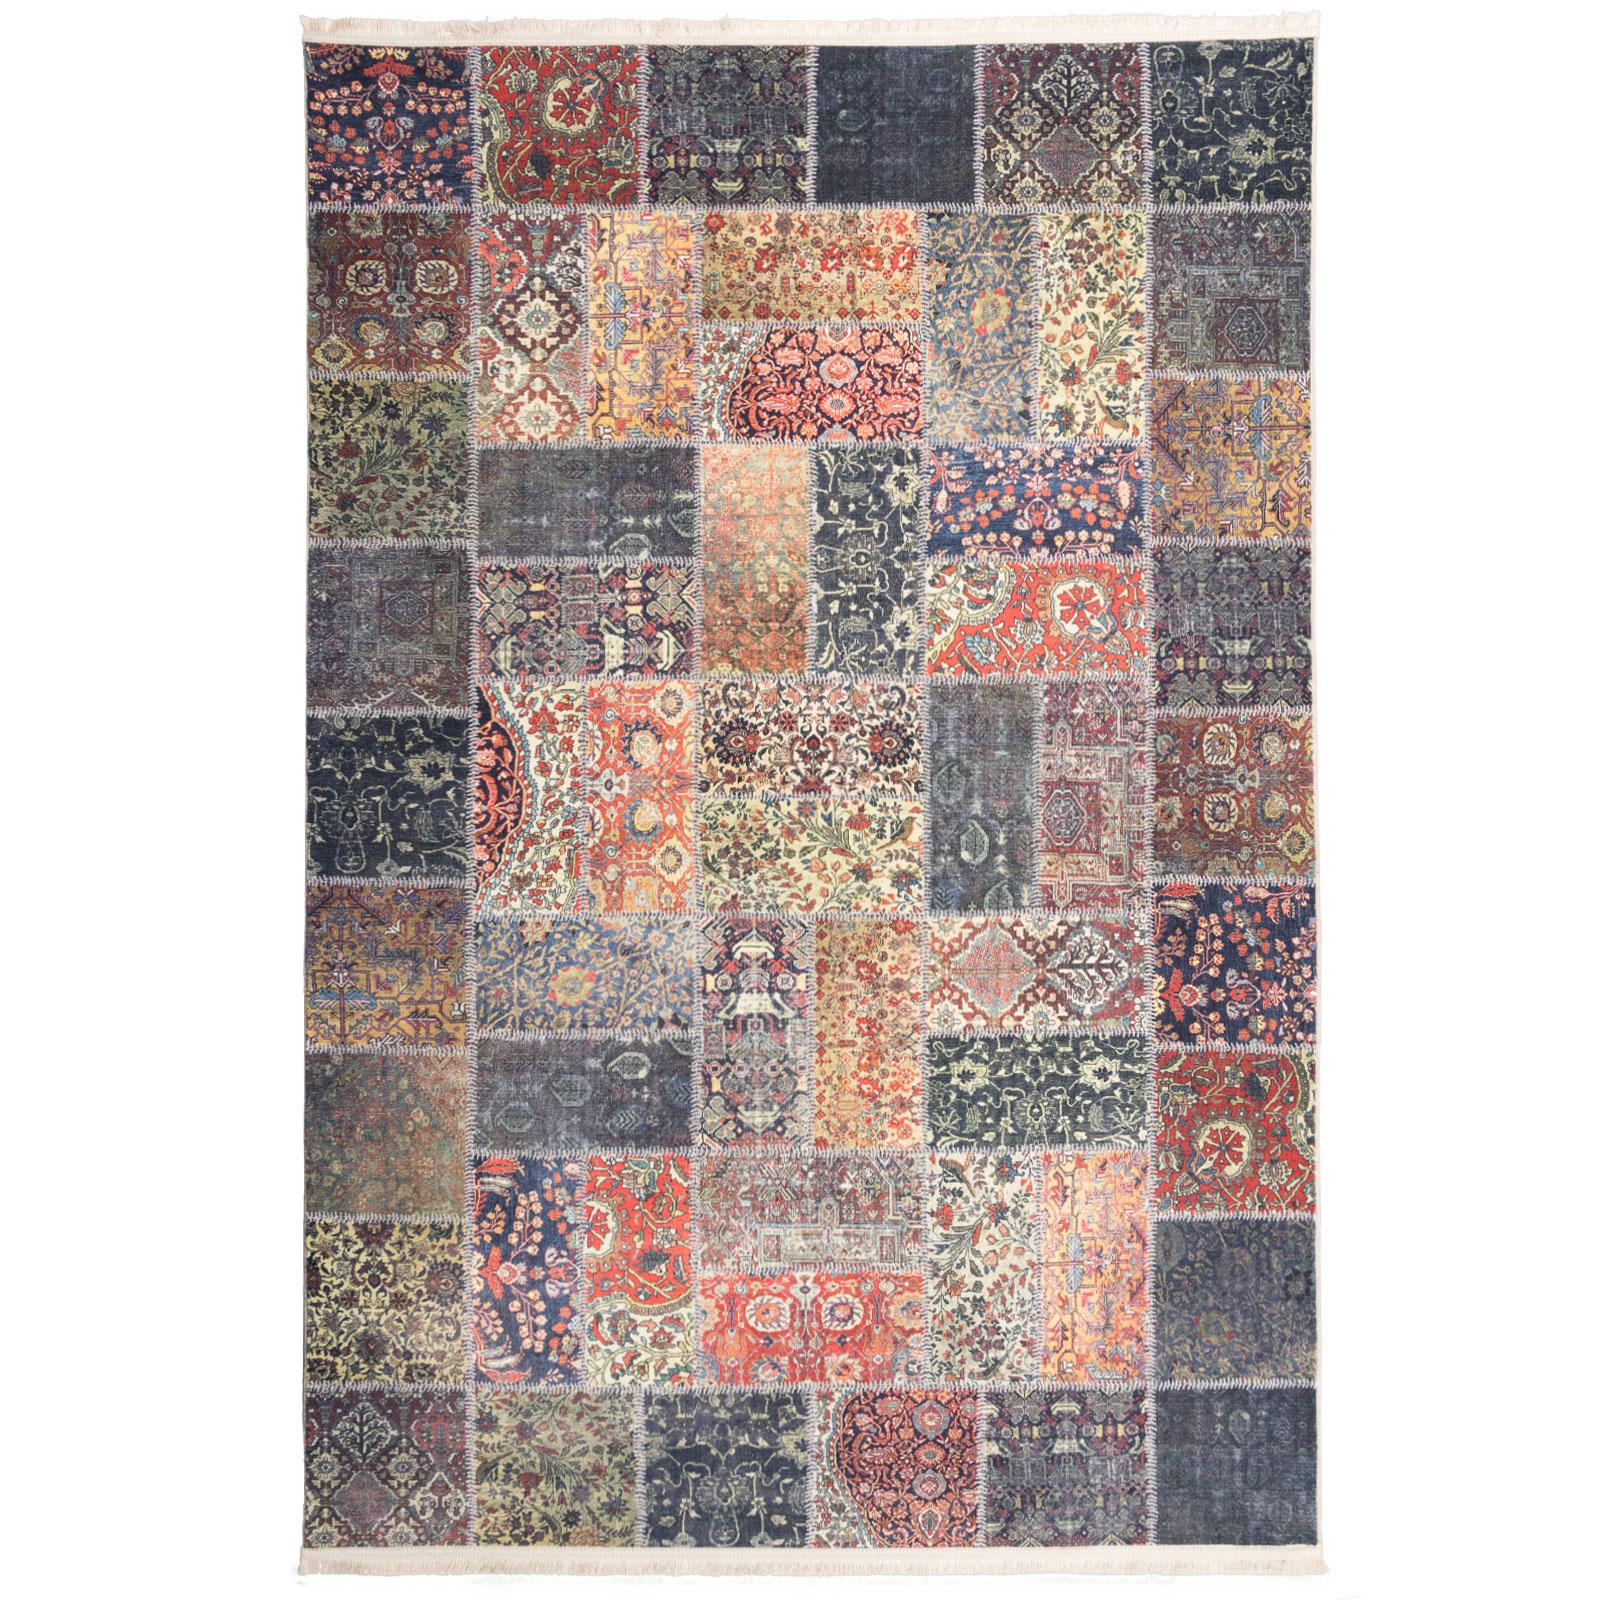 فرش ماشینی محتشم طرح چهل تکه کد 100511